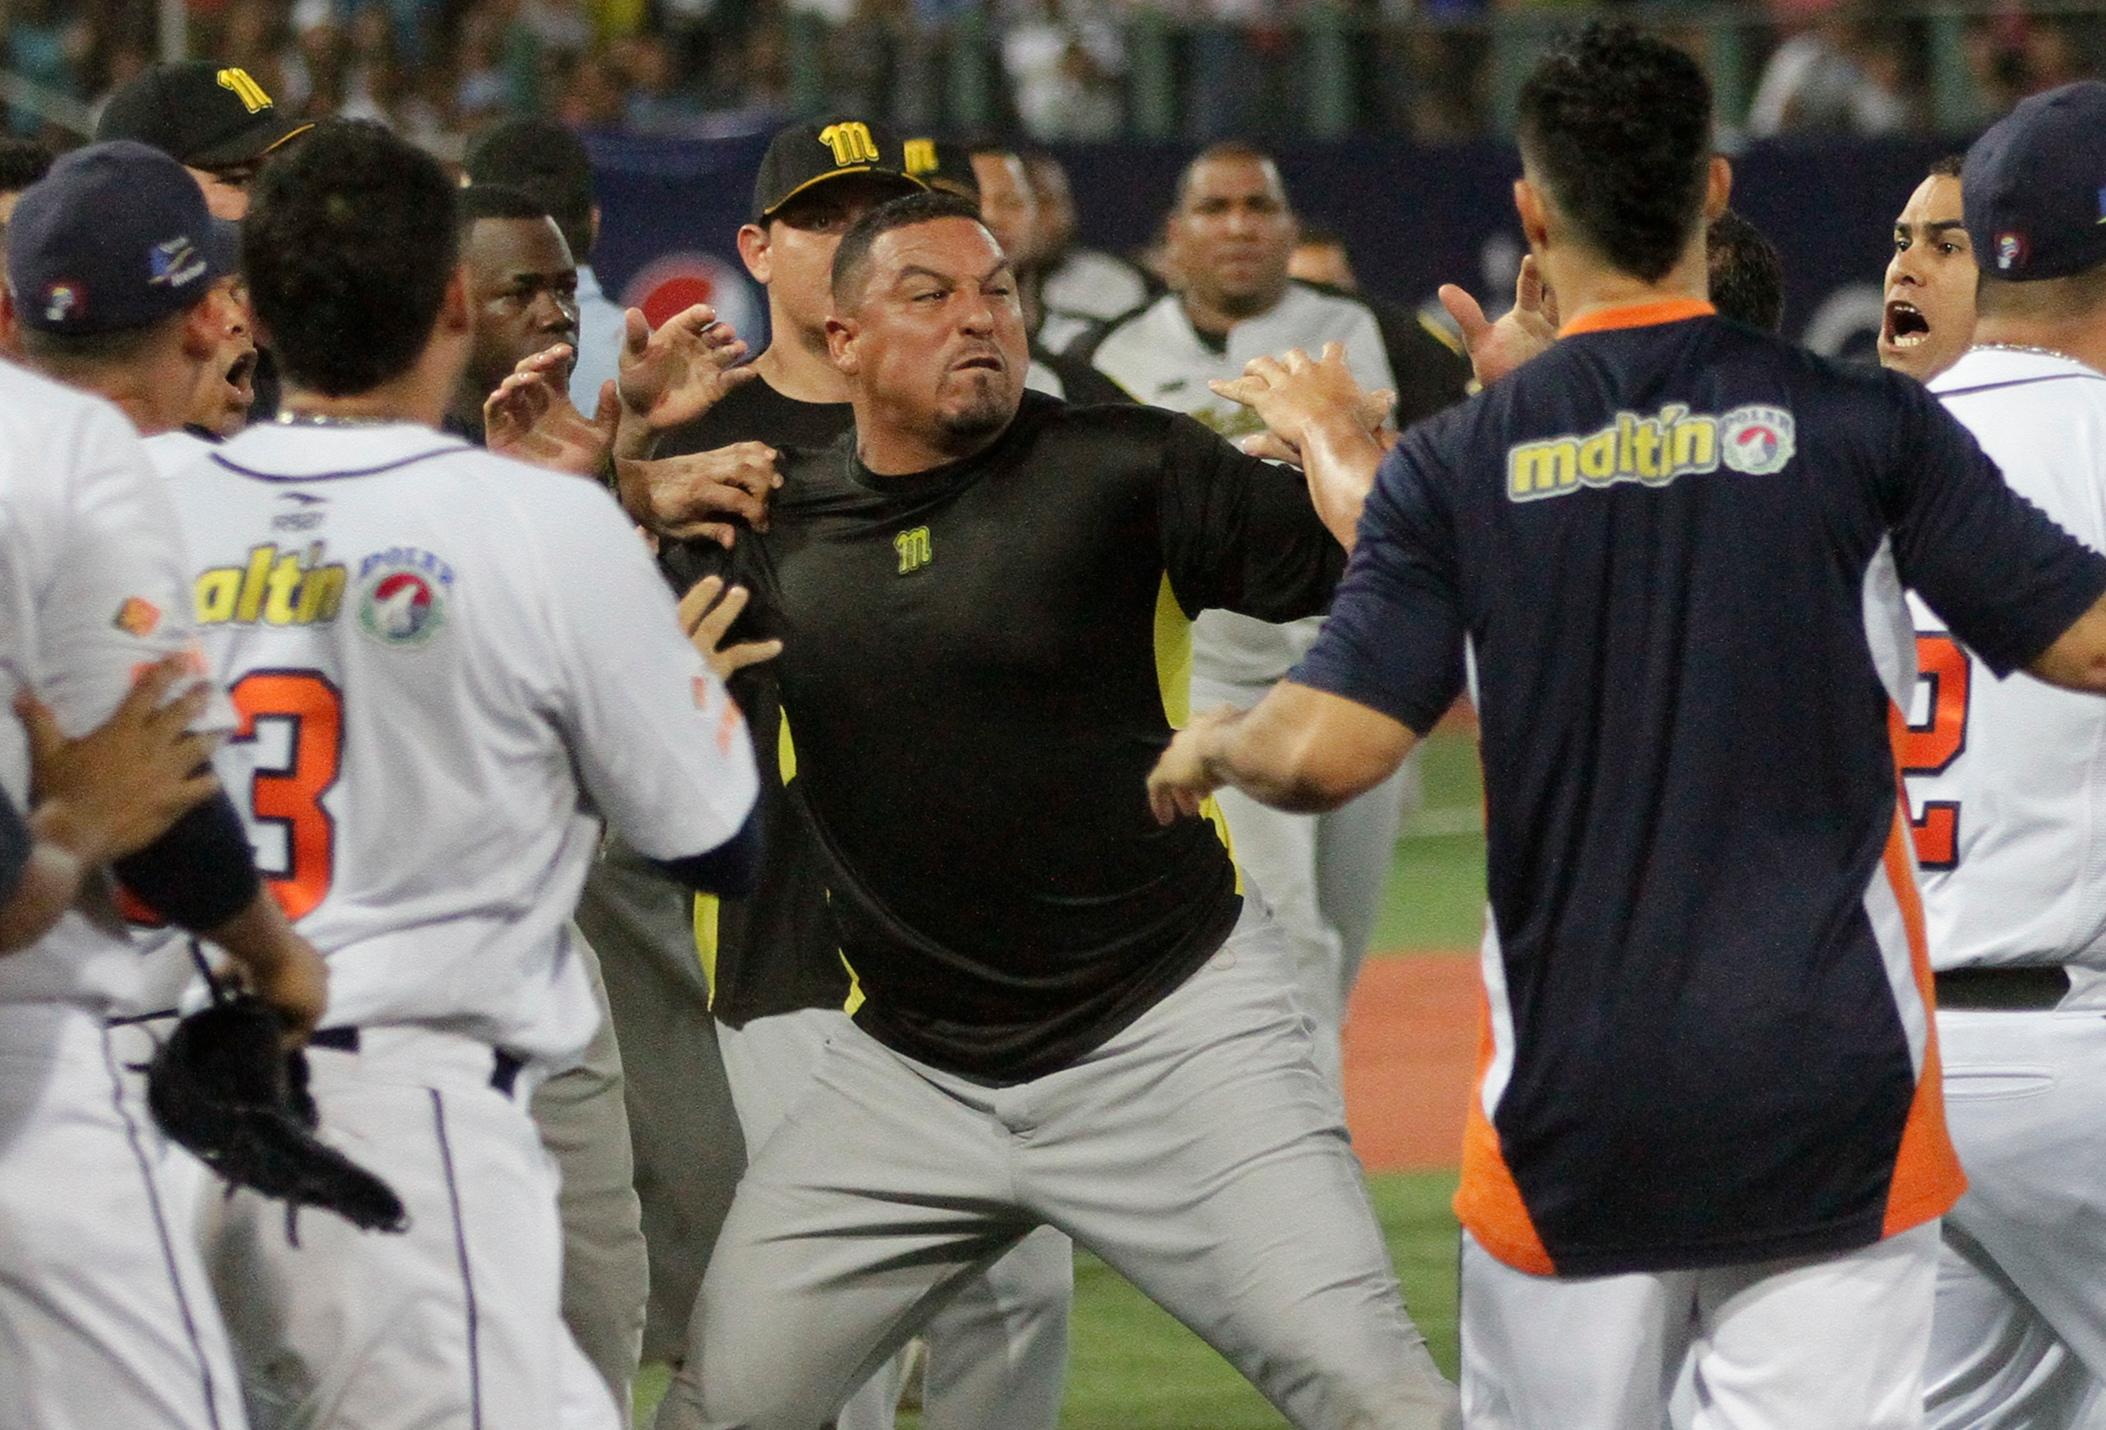 Zambrano apologies for Venezuela dustup